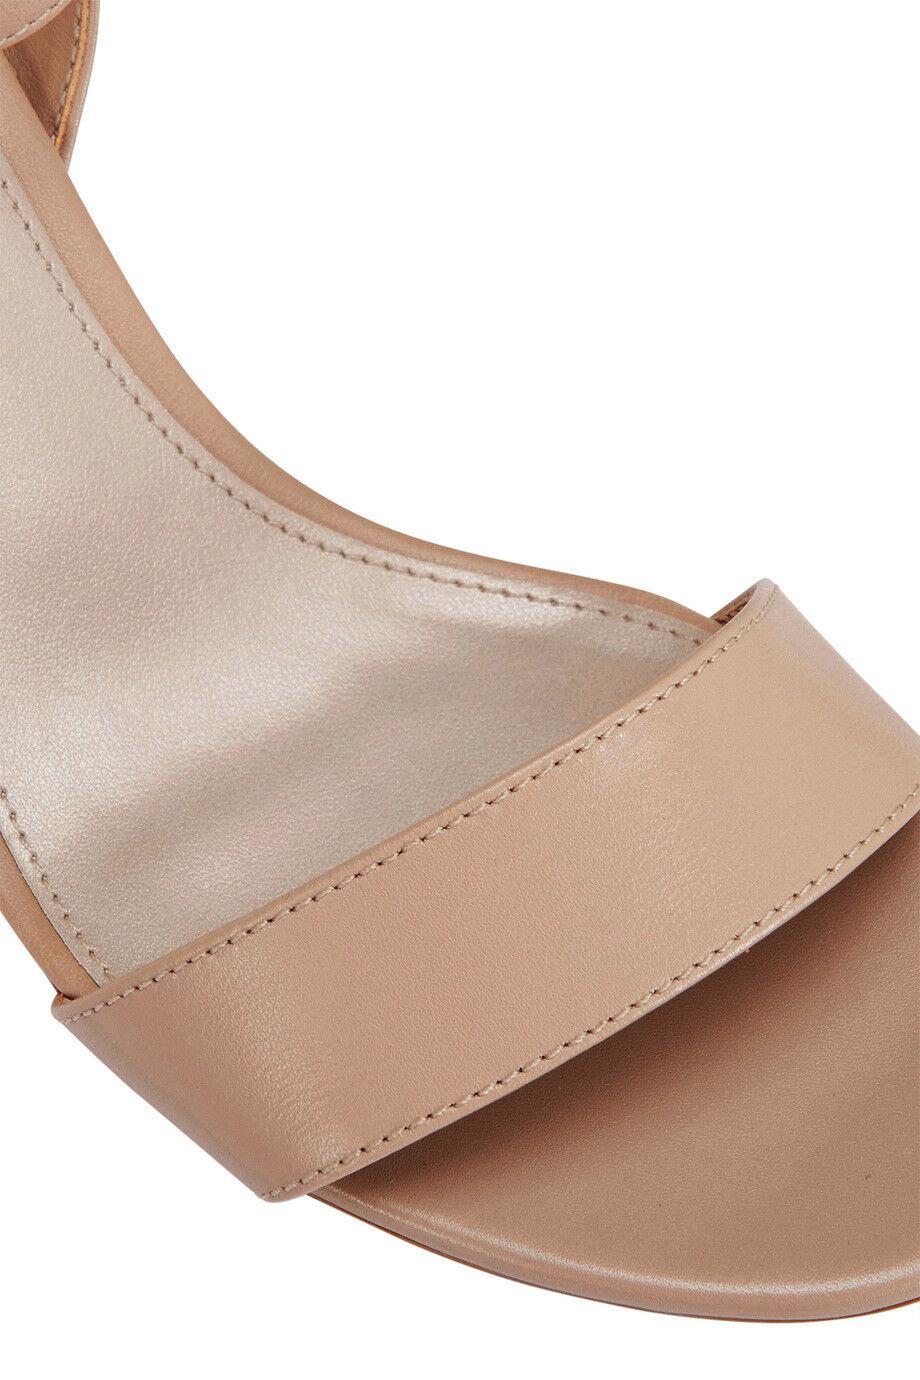 NEW Sandler Alpha Nude Glove Sandal Beige Beige Beige 742264